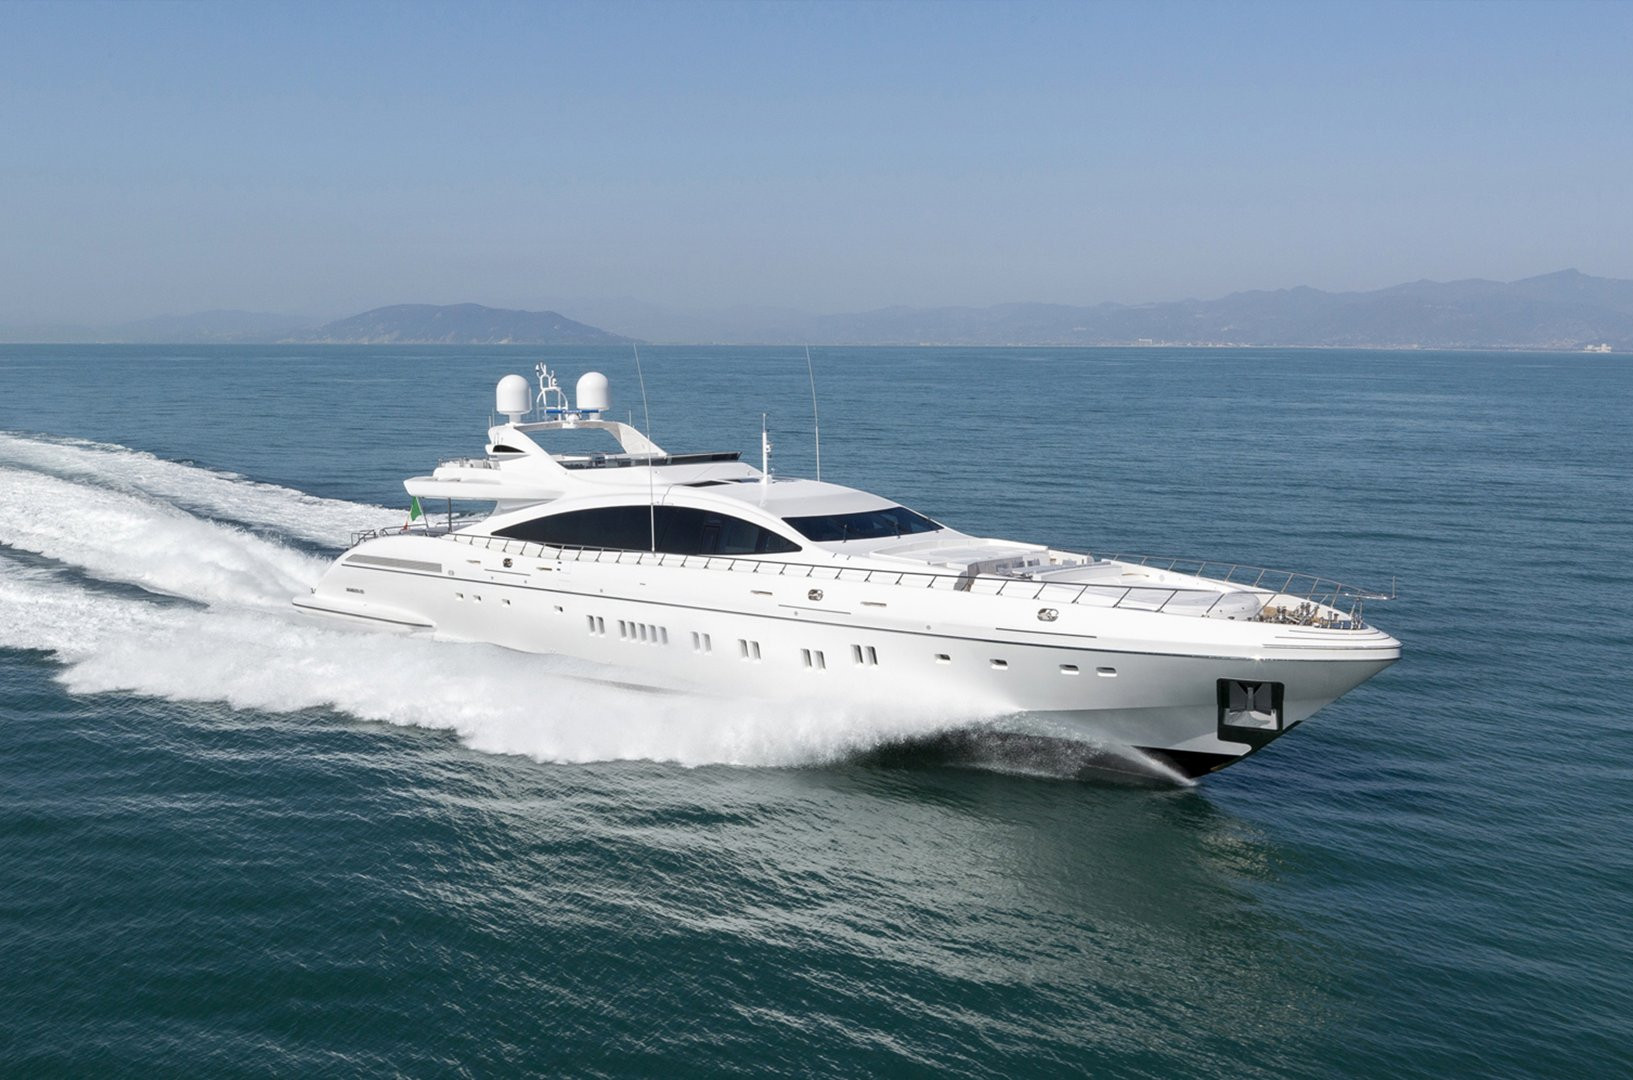 Yacht DA VINCI Mangust 50m, at nearly 40 knots speed